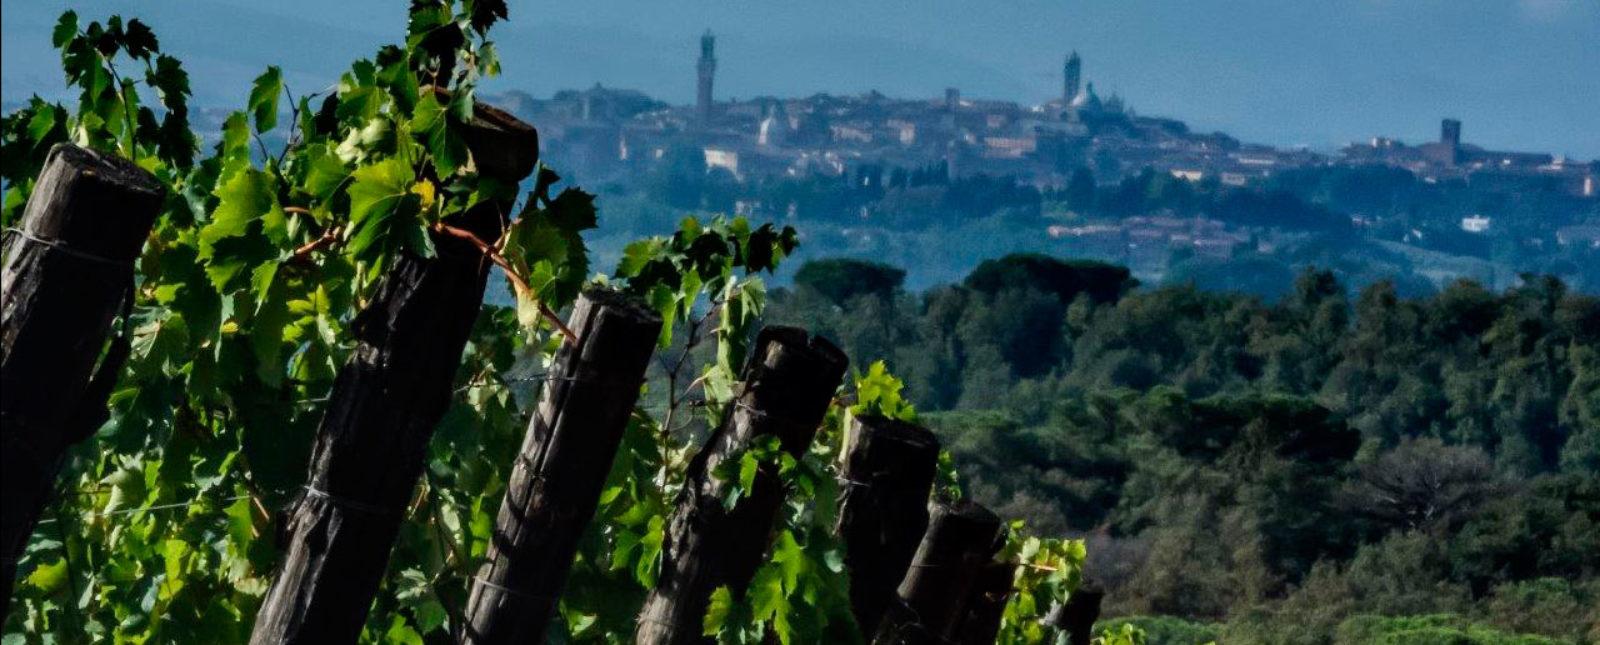 Terra-di-Seta_vista-Siena